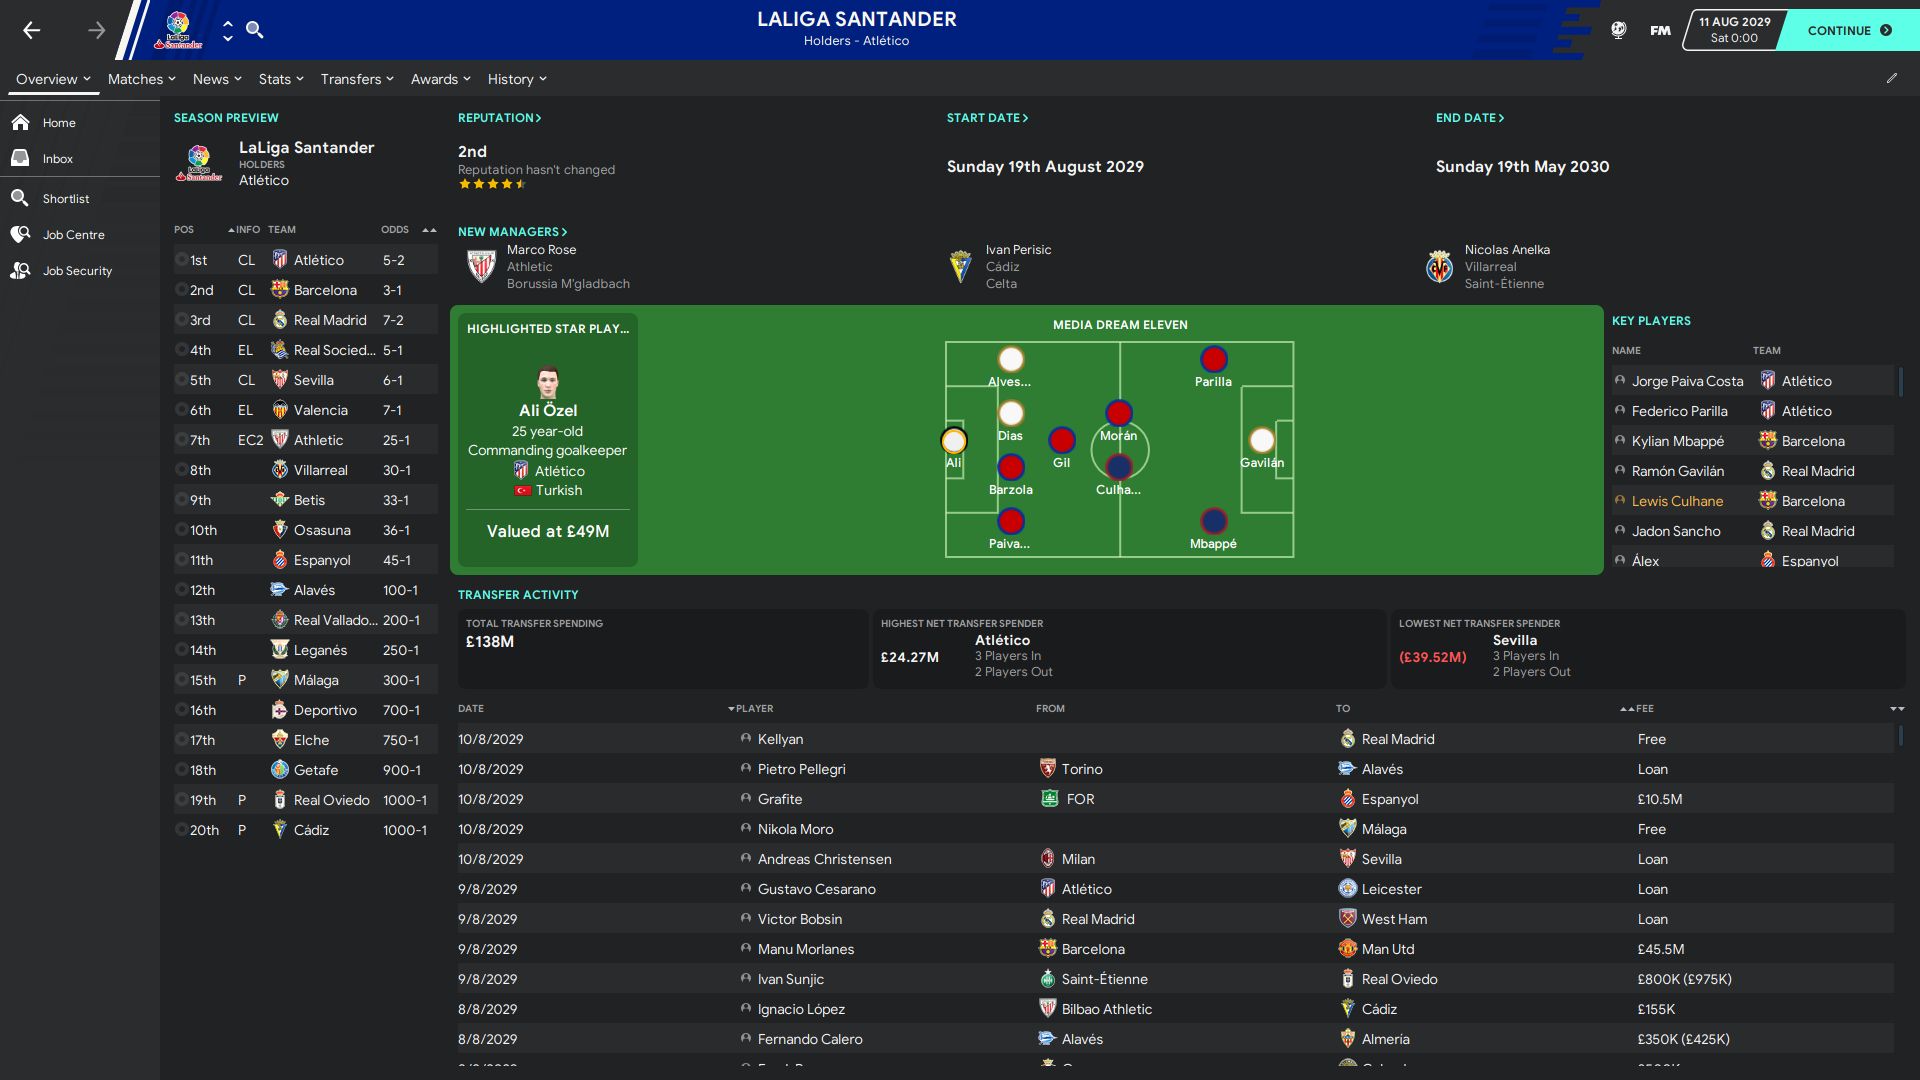 LaLiga Santander_ Season Preview.png